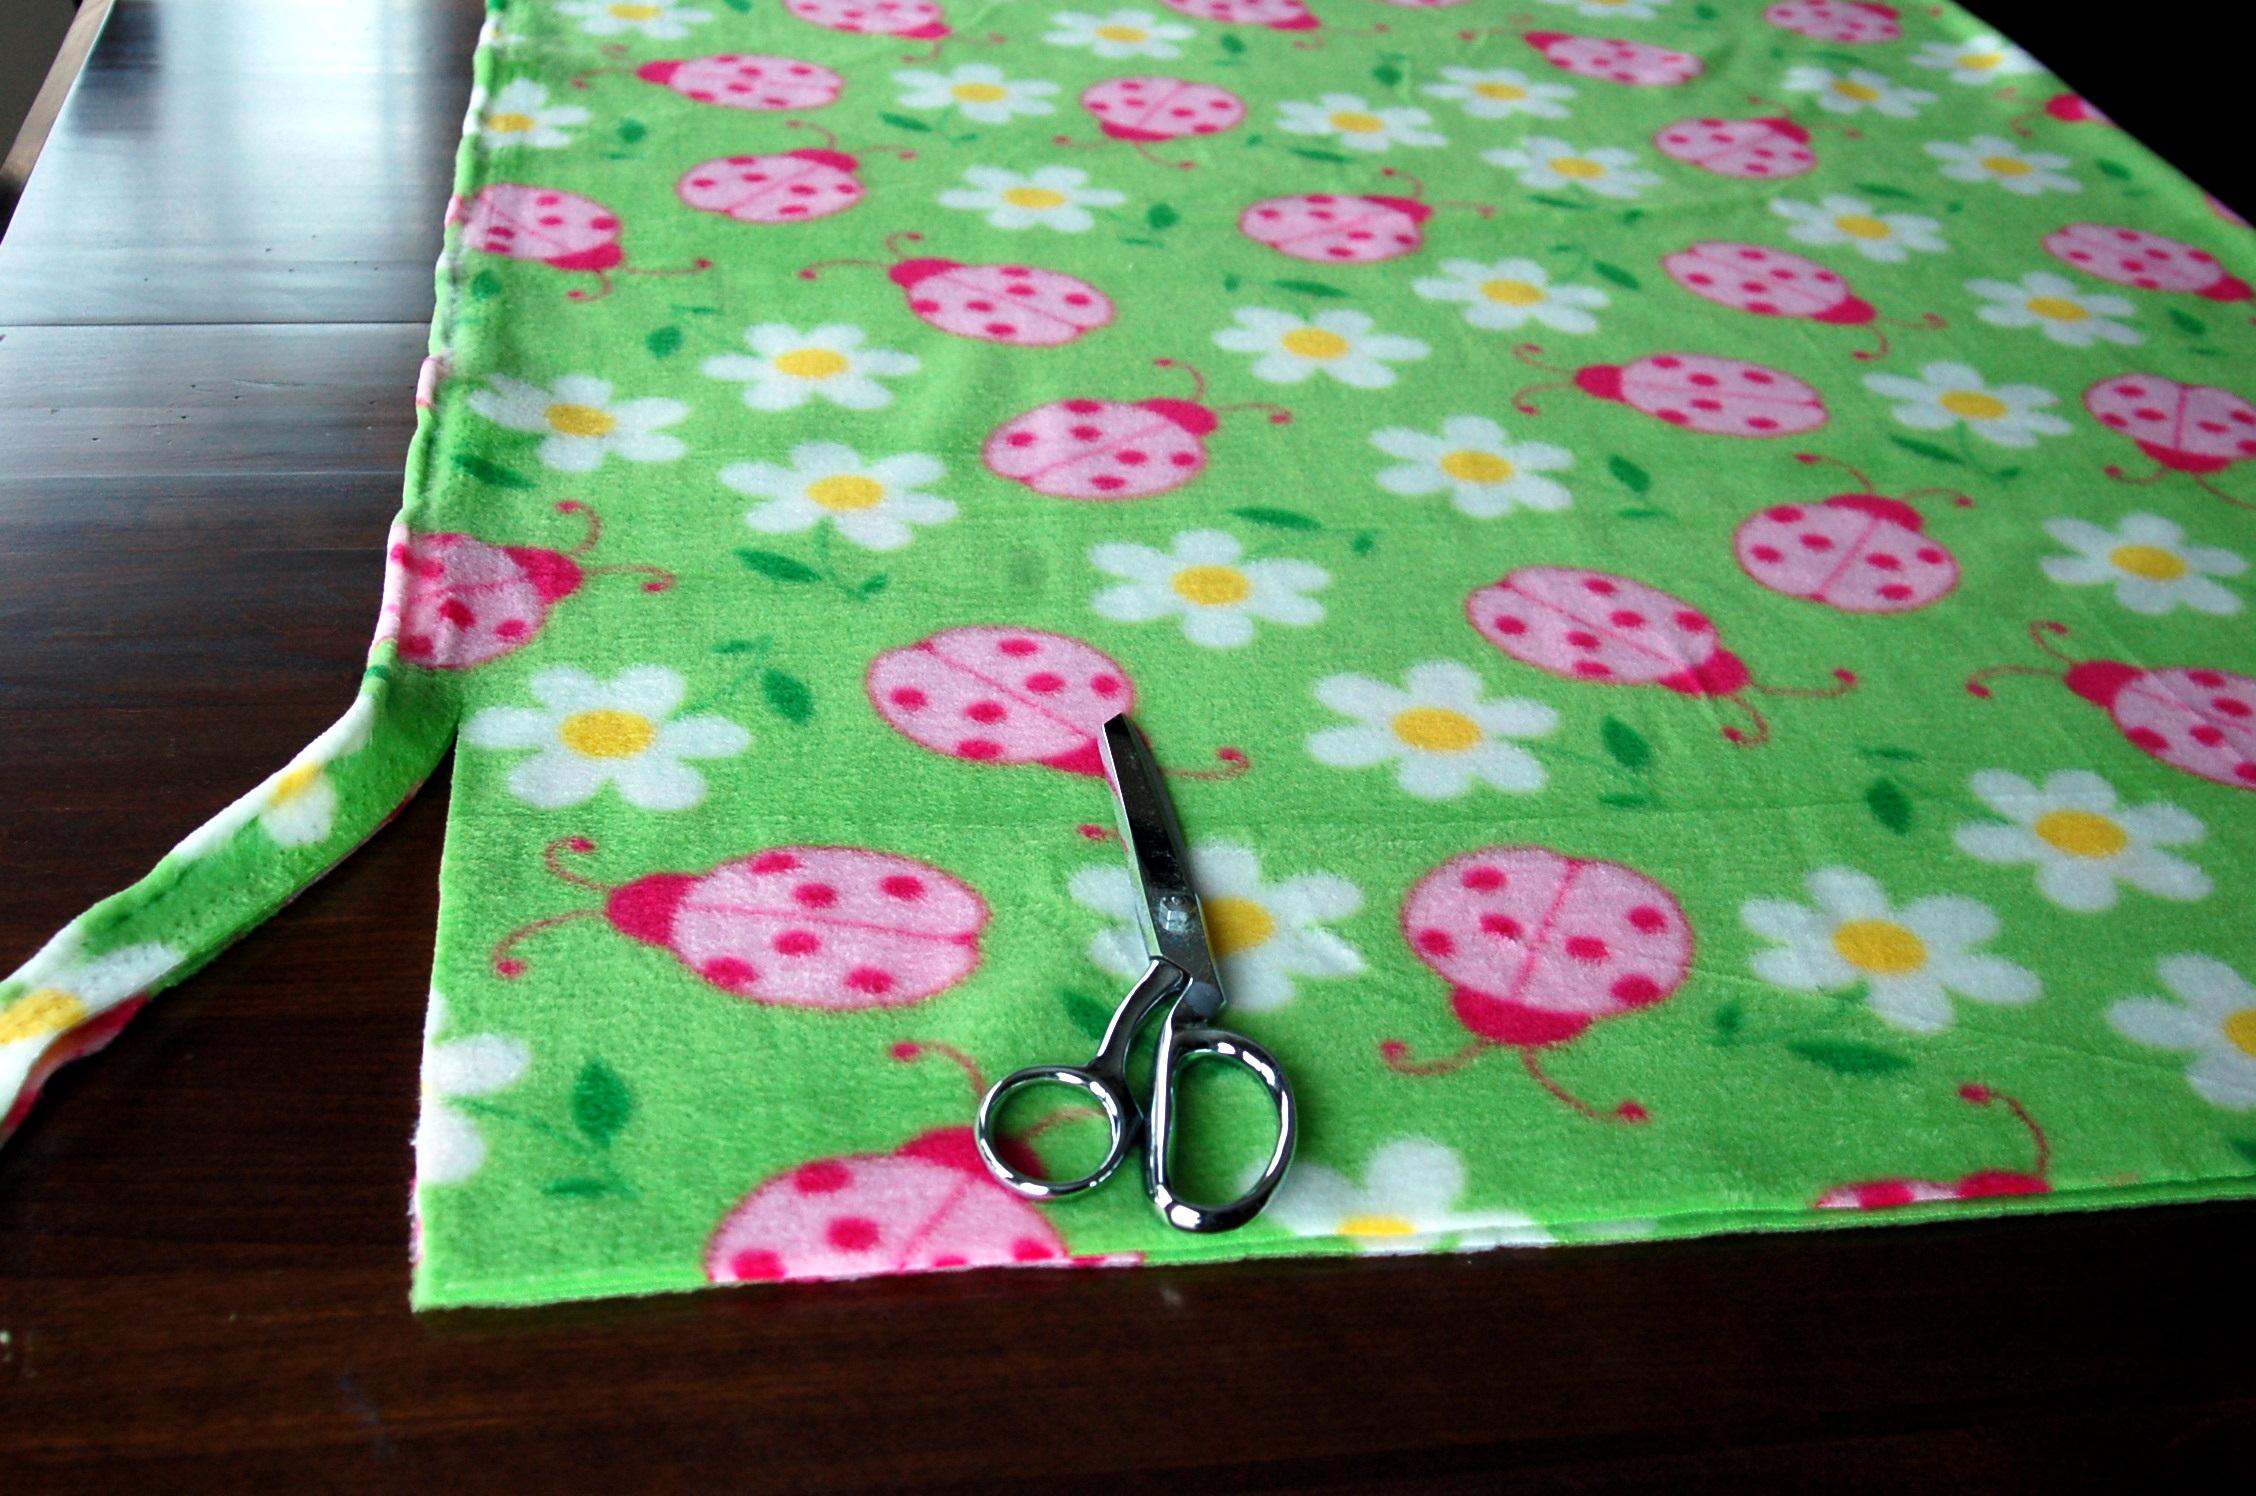 Fleece Blanket Edging Ideas - Then